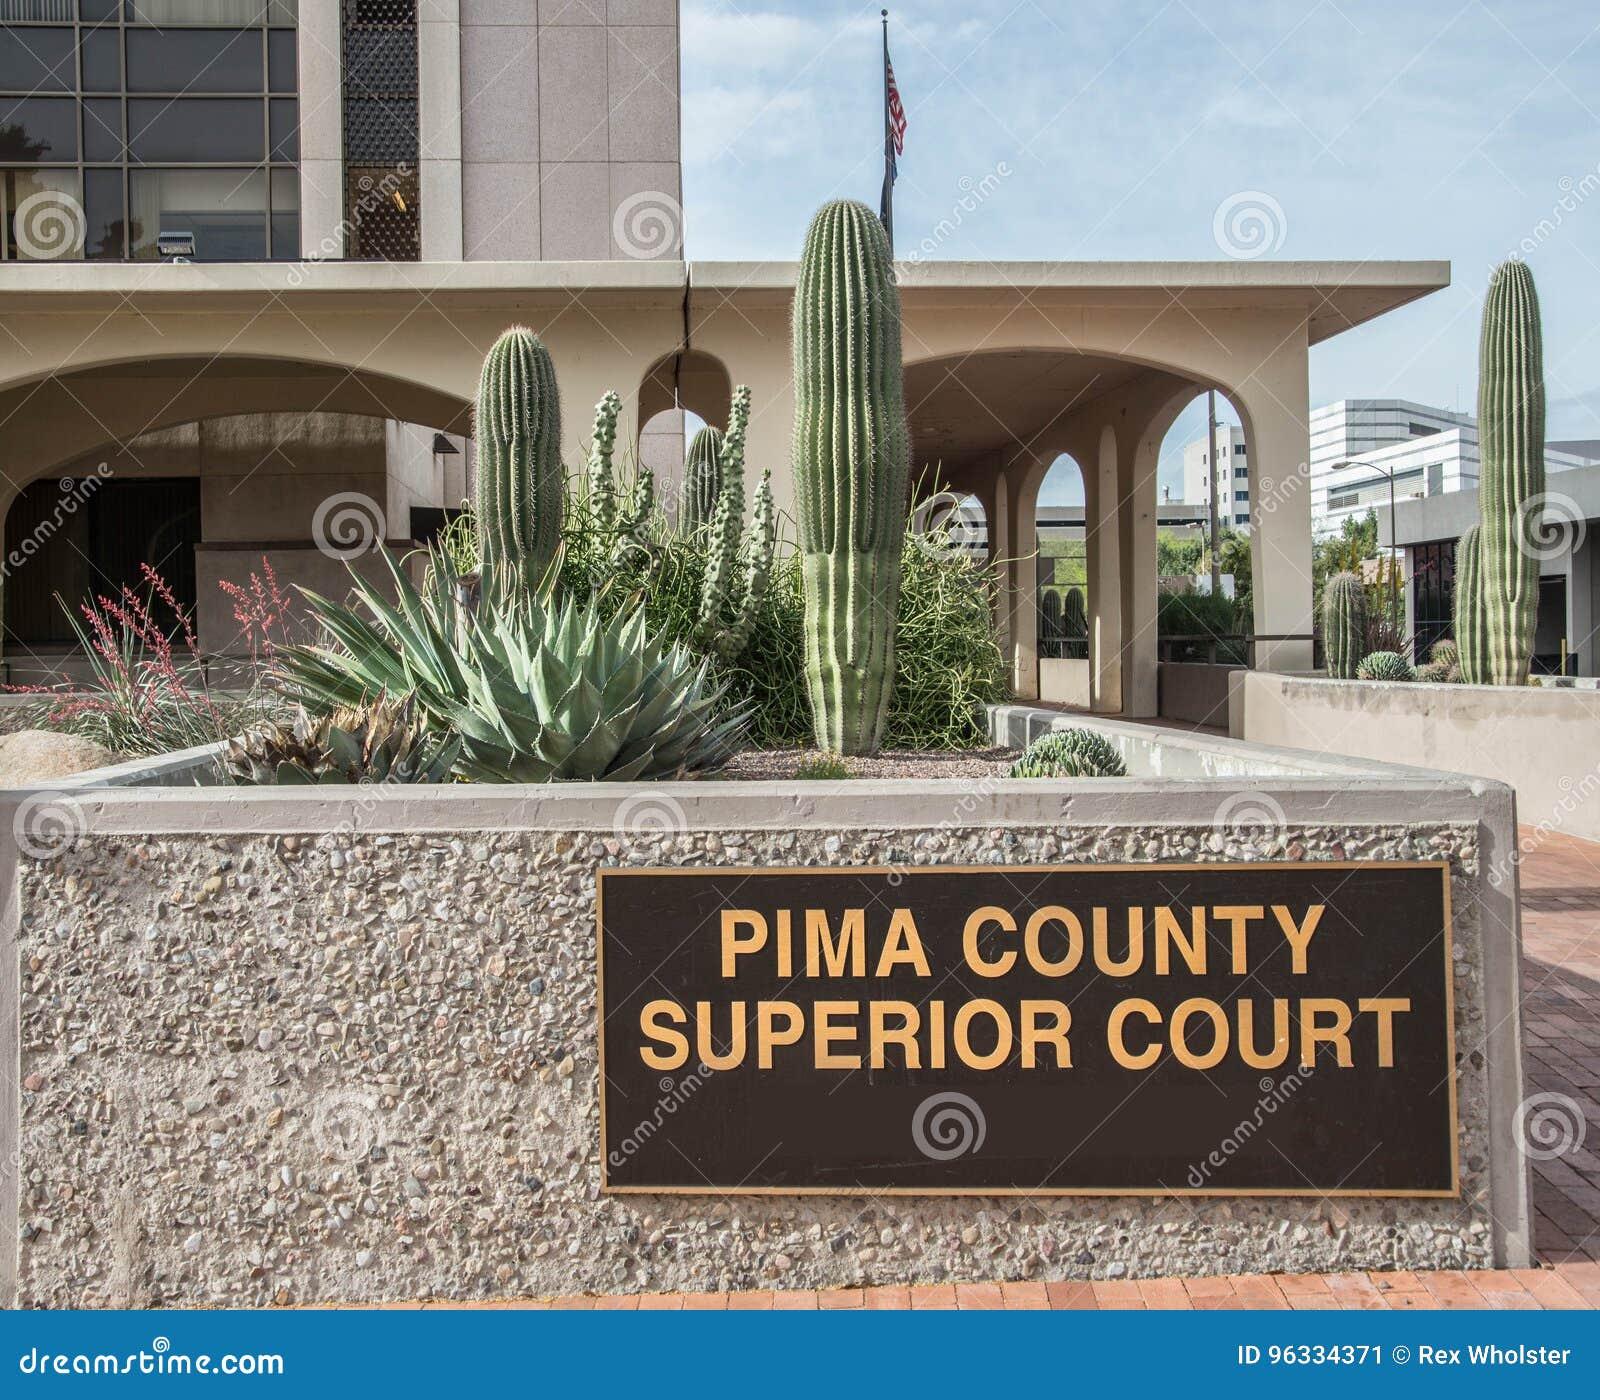 Pima County Superior Court In Tucson, Arizona Editorial Photo